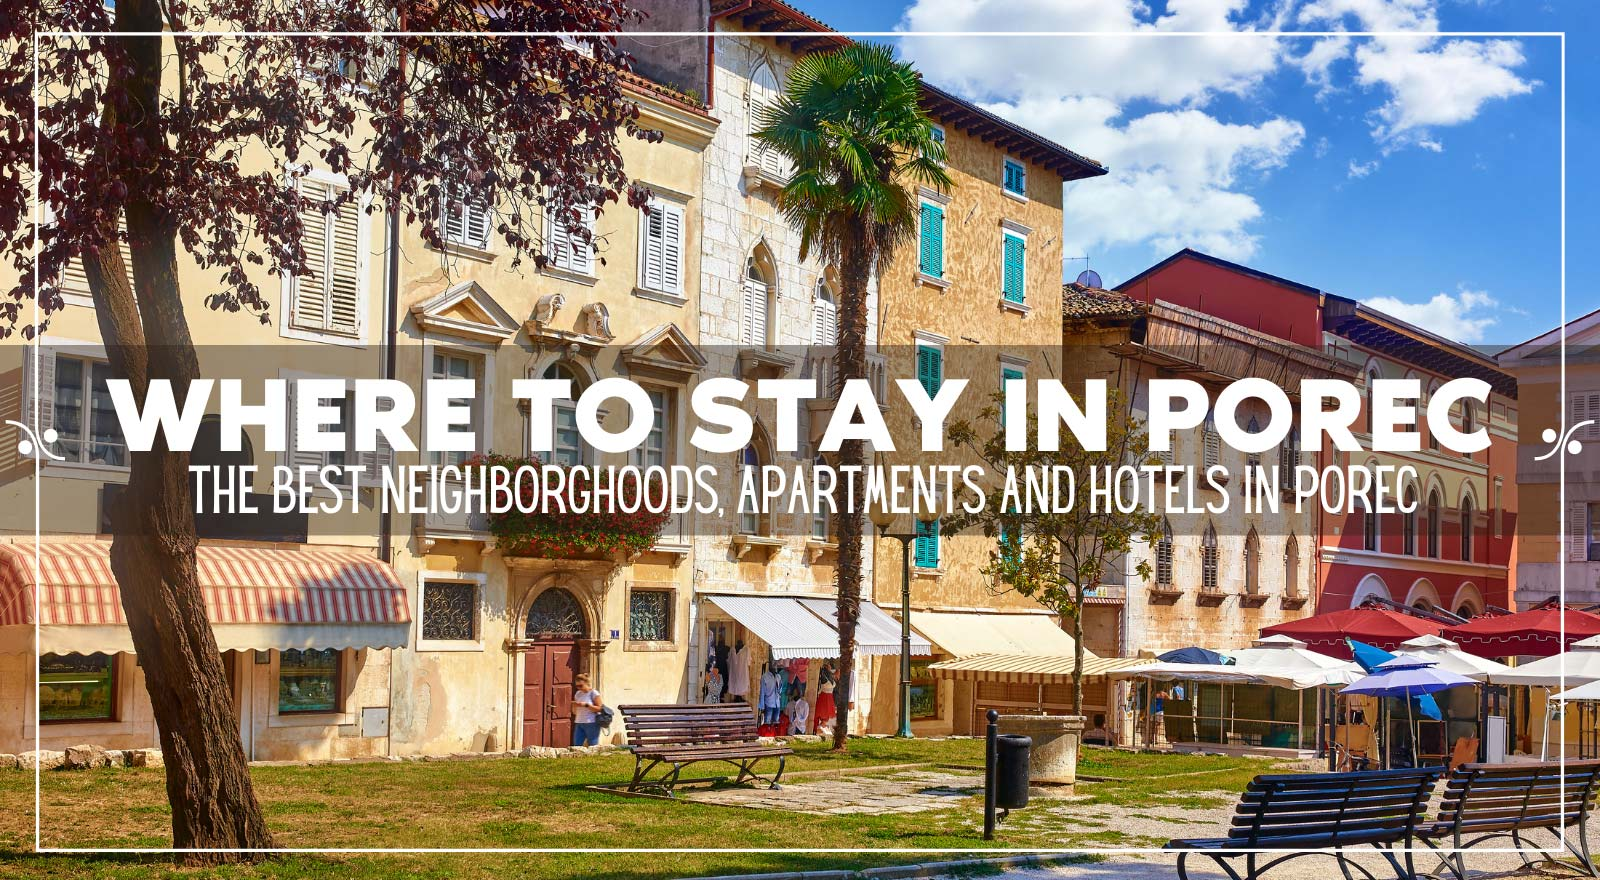 Porec Accommodation: Where To Stay In Porec, Illustration